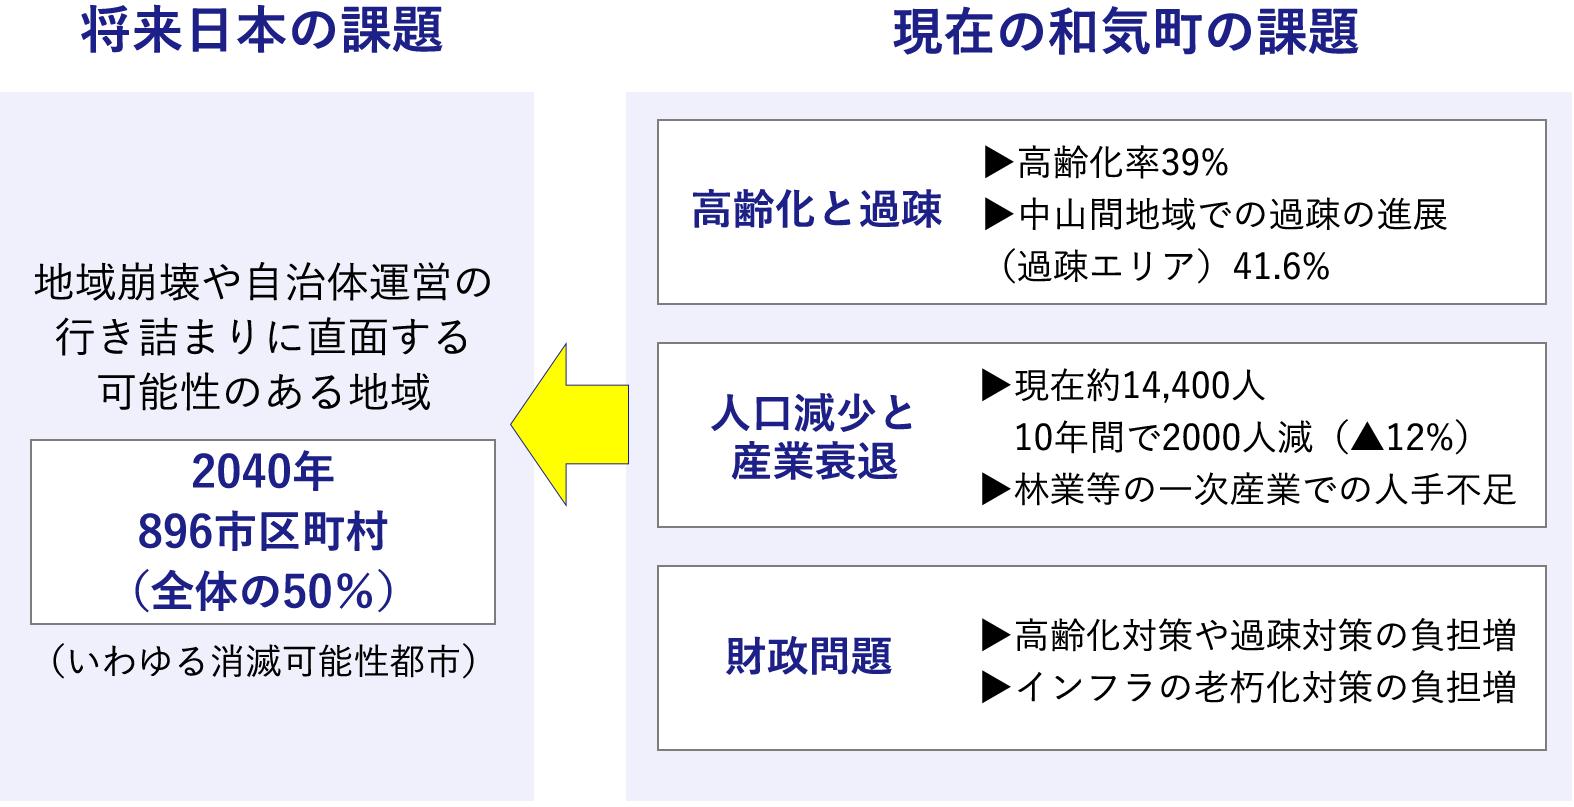 現在の和気町の課題と将来日本の課題